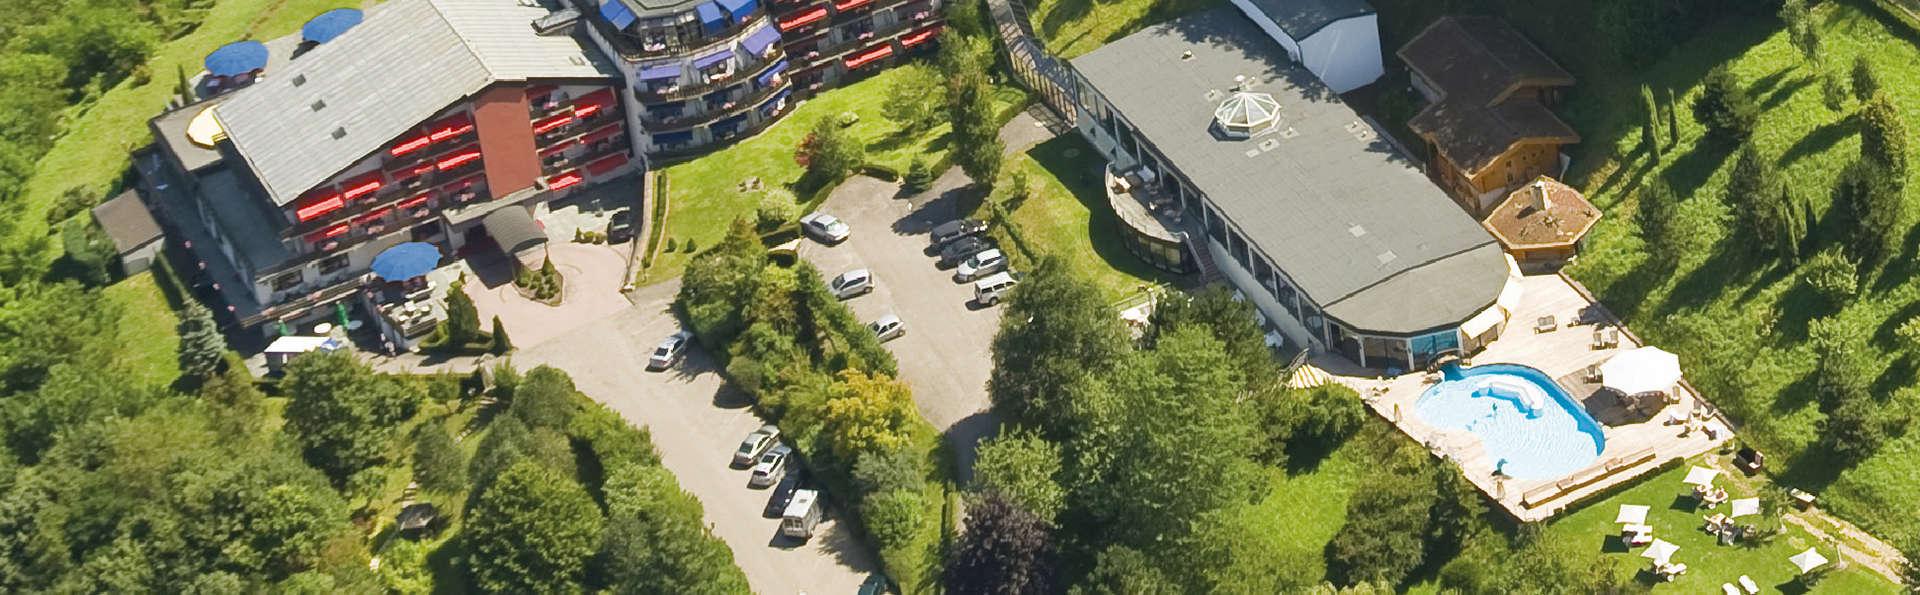 Hotel Eden au Lac - Edit_View.jpg